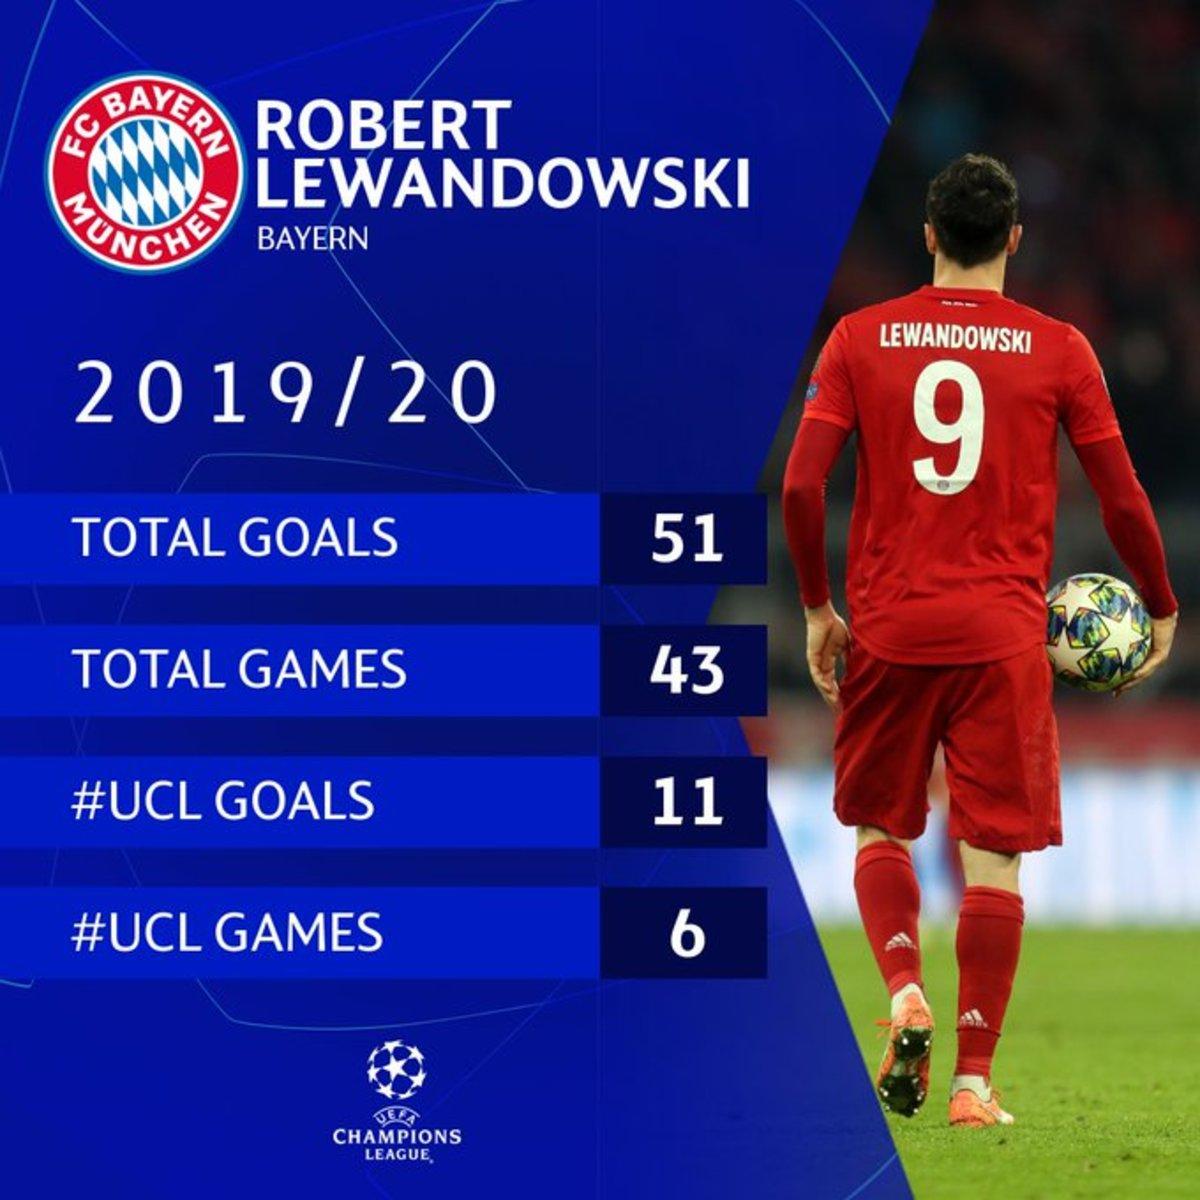 Robert Lewandowski's stats 2019/2020 season